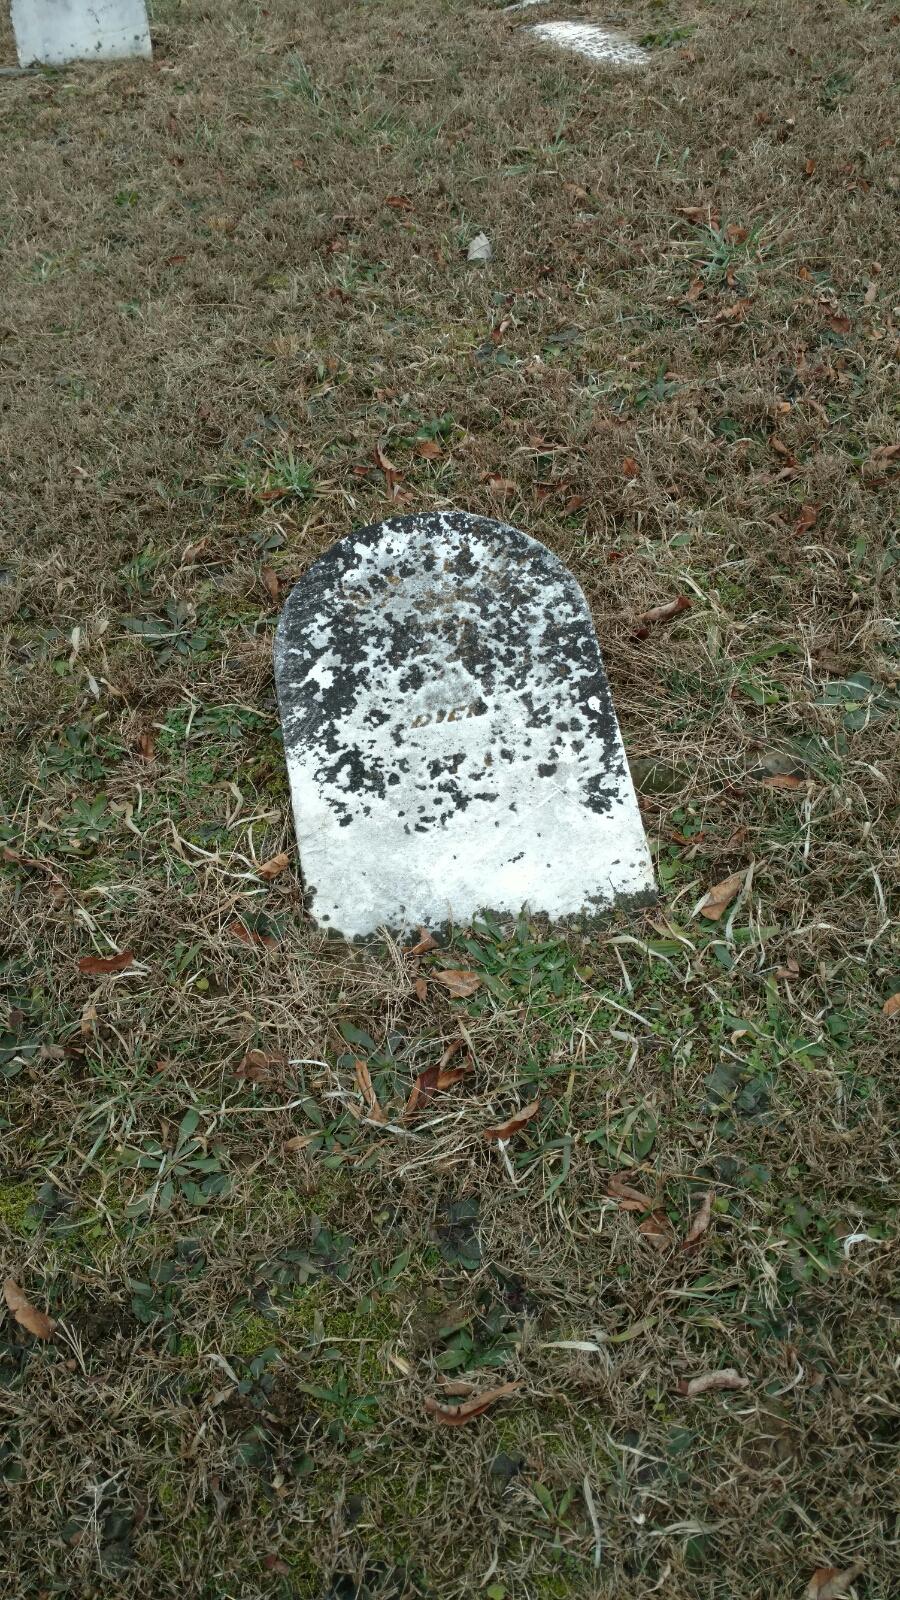 Michael Fenton (1801-1880) - Find A Grave Memorial